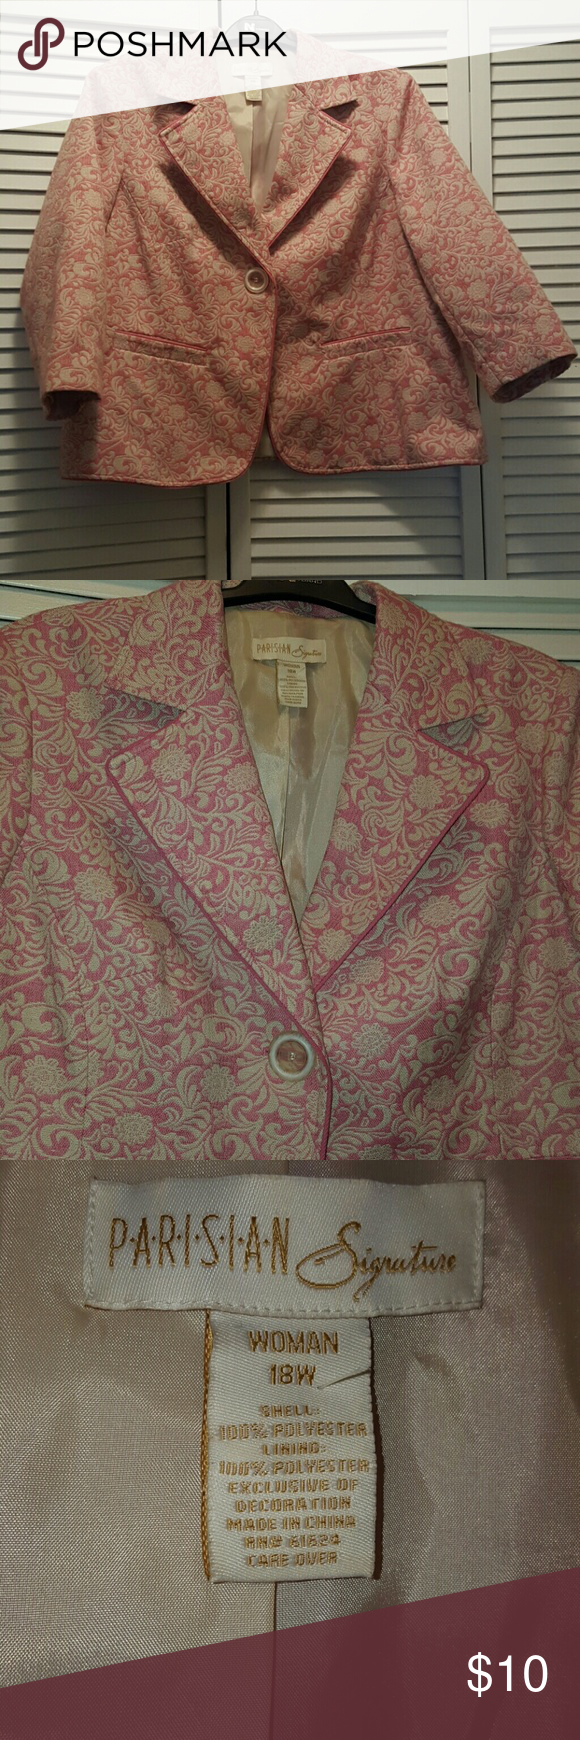 Parisian Pattern Blazer Jacket Parisian Pink and Cream Pattern Jacket/Blazer. Size 18W. *worn* parisian  Jackets & Coats